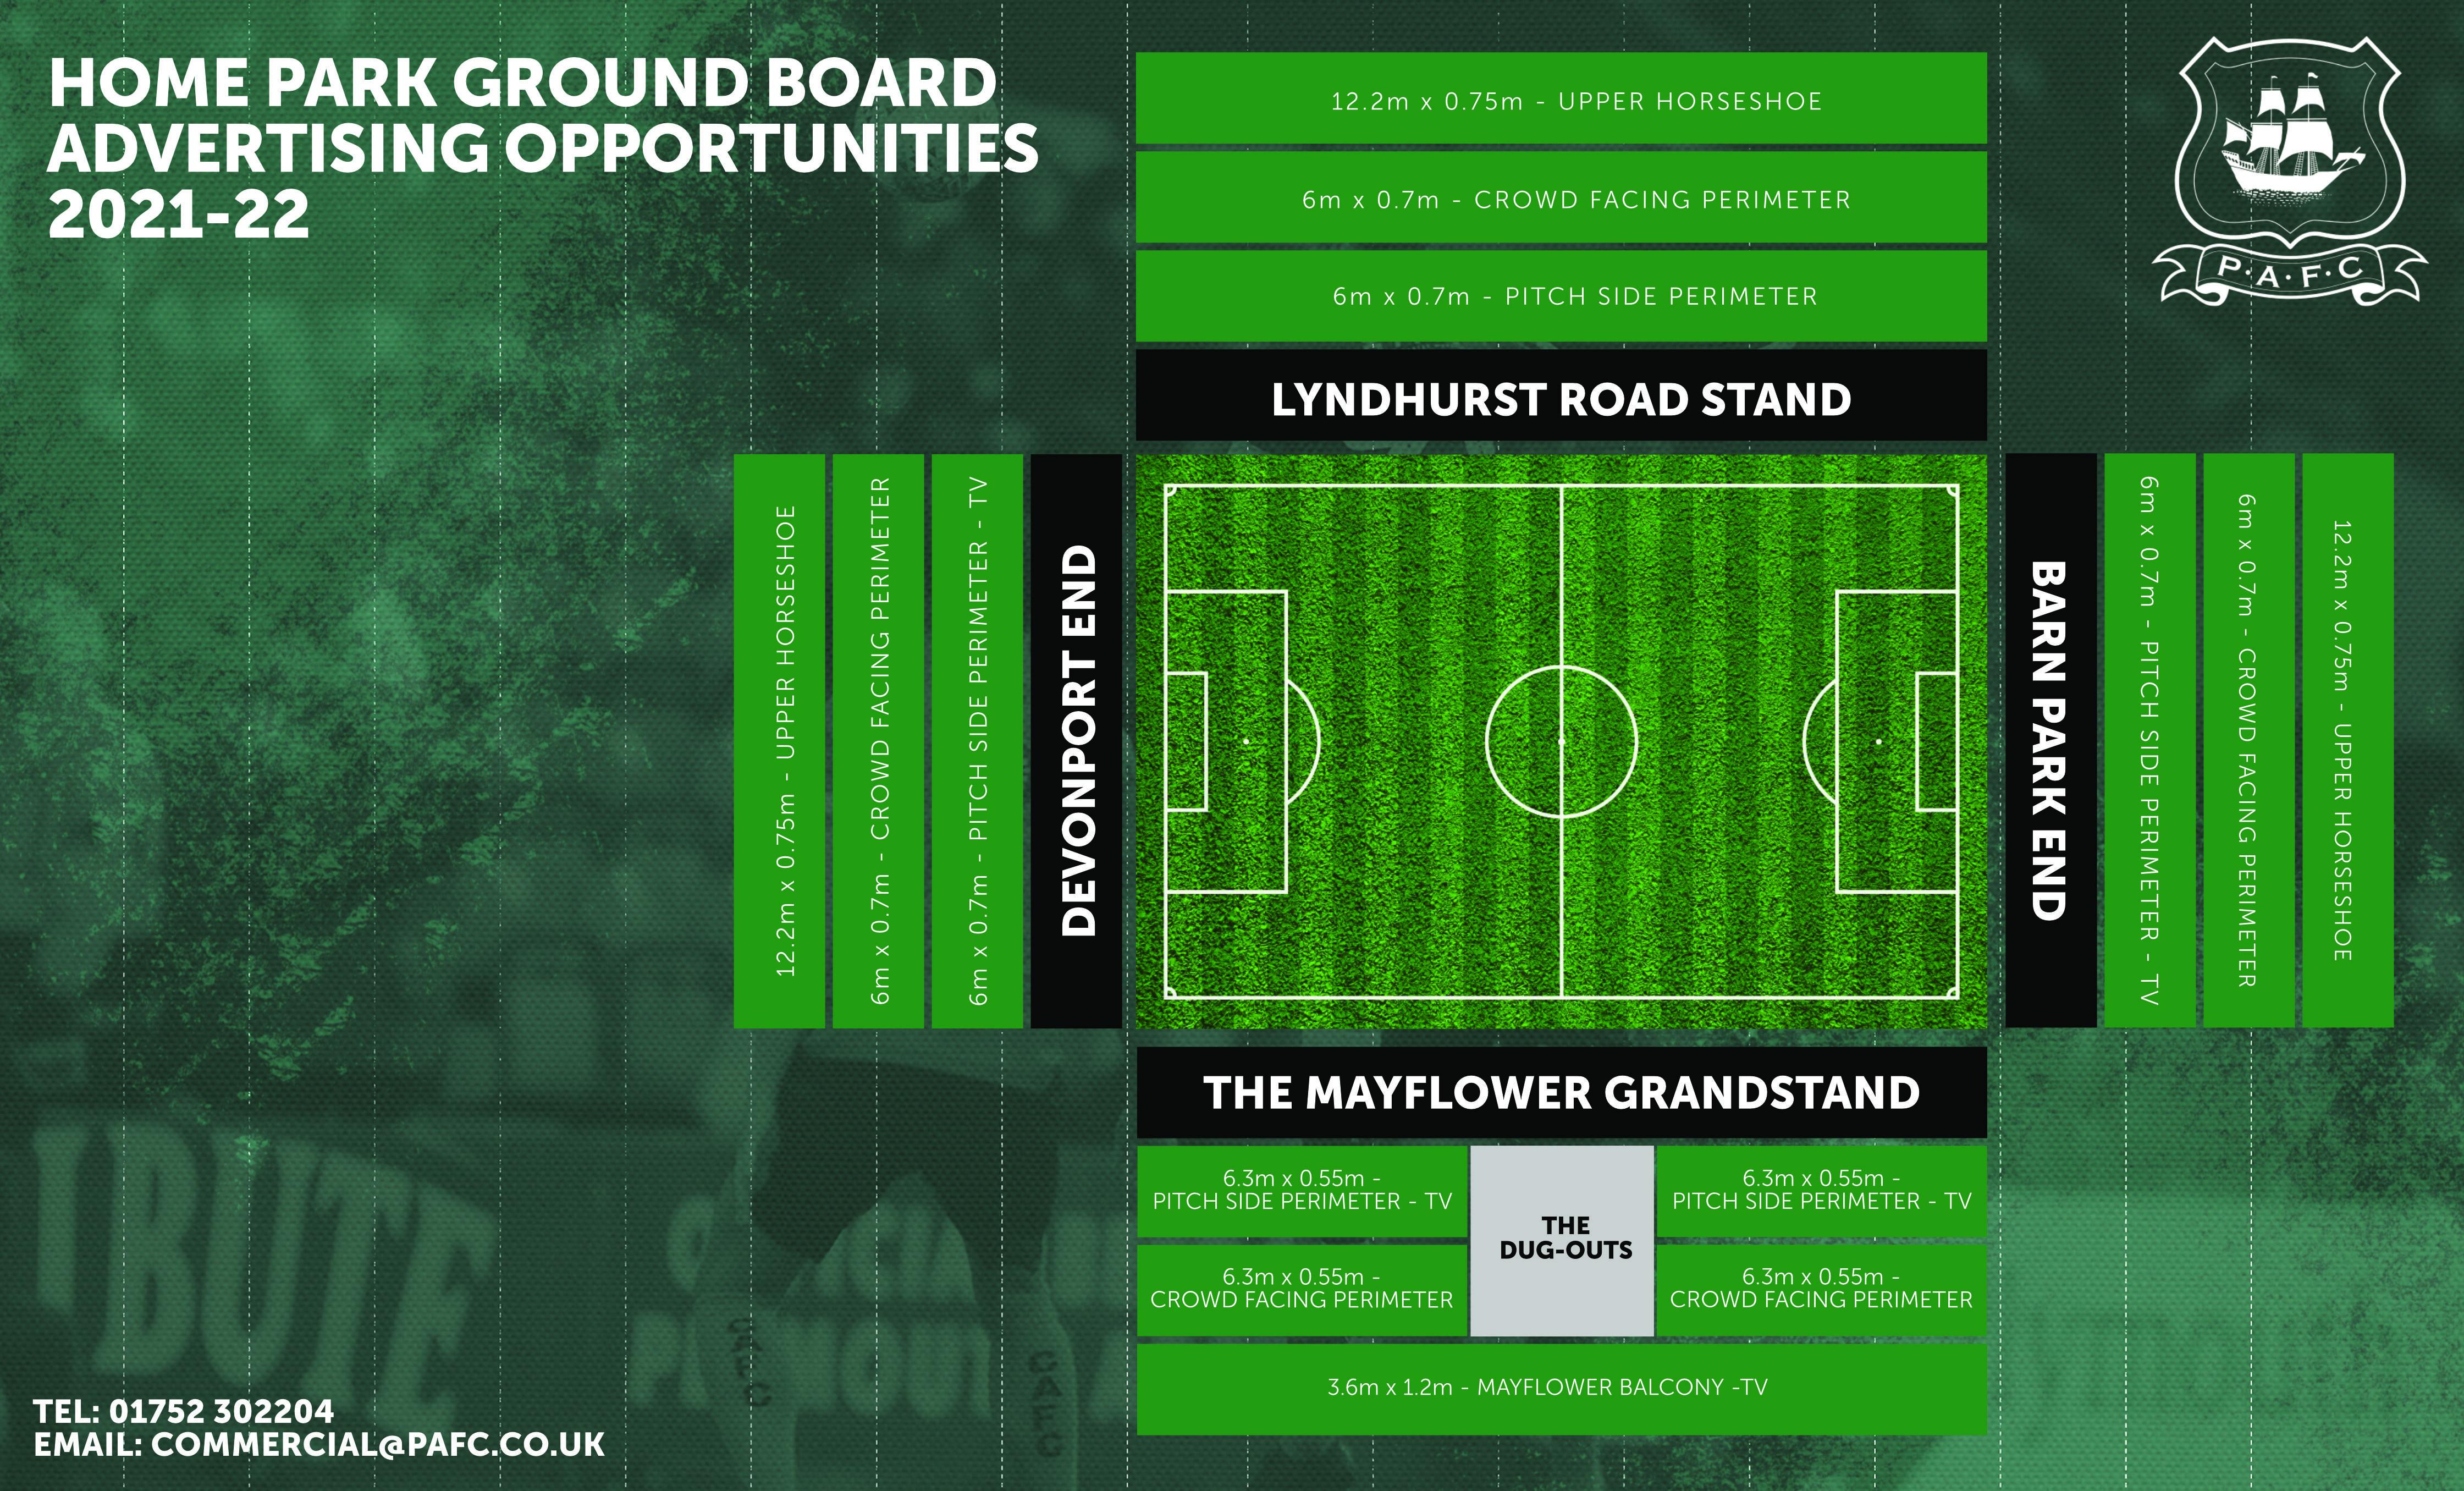 Ground Board Advertising Plan